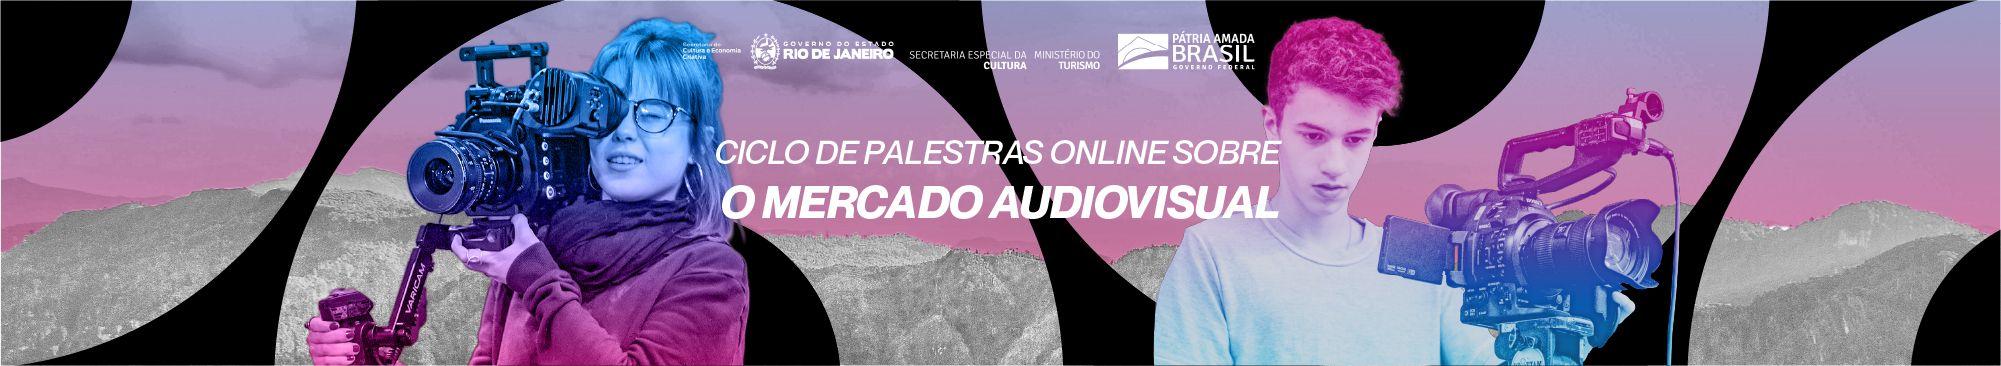 De 22 a 26 de Fevereiro Ciclo de Palestras sobre o Mercado Audiovisual no Youtube da AIC